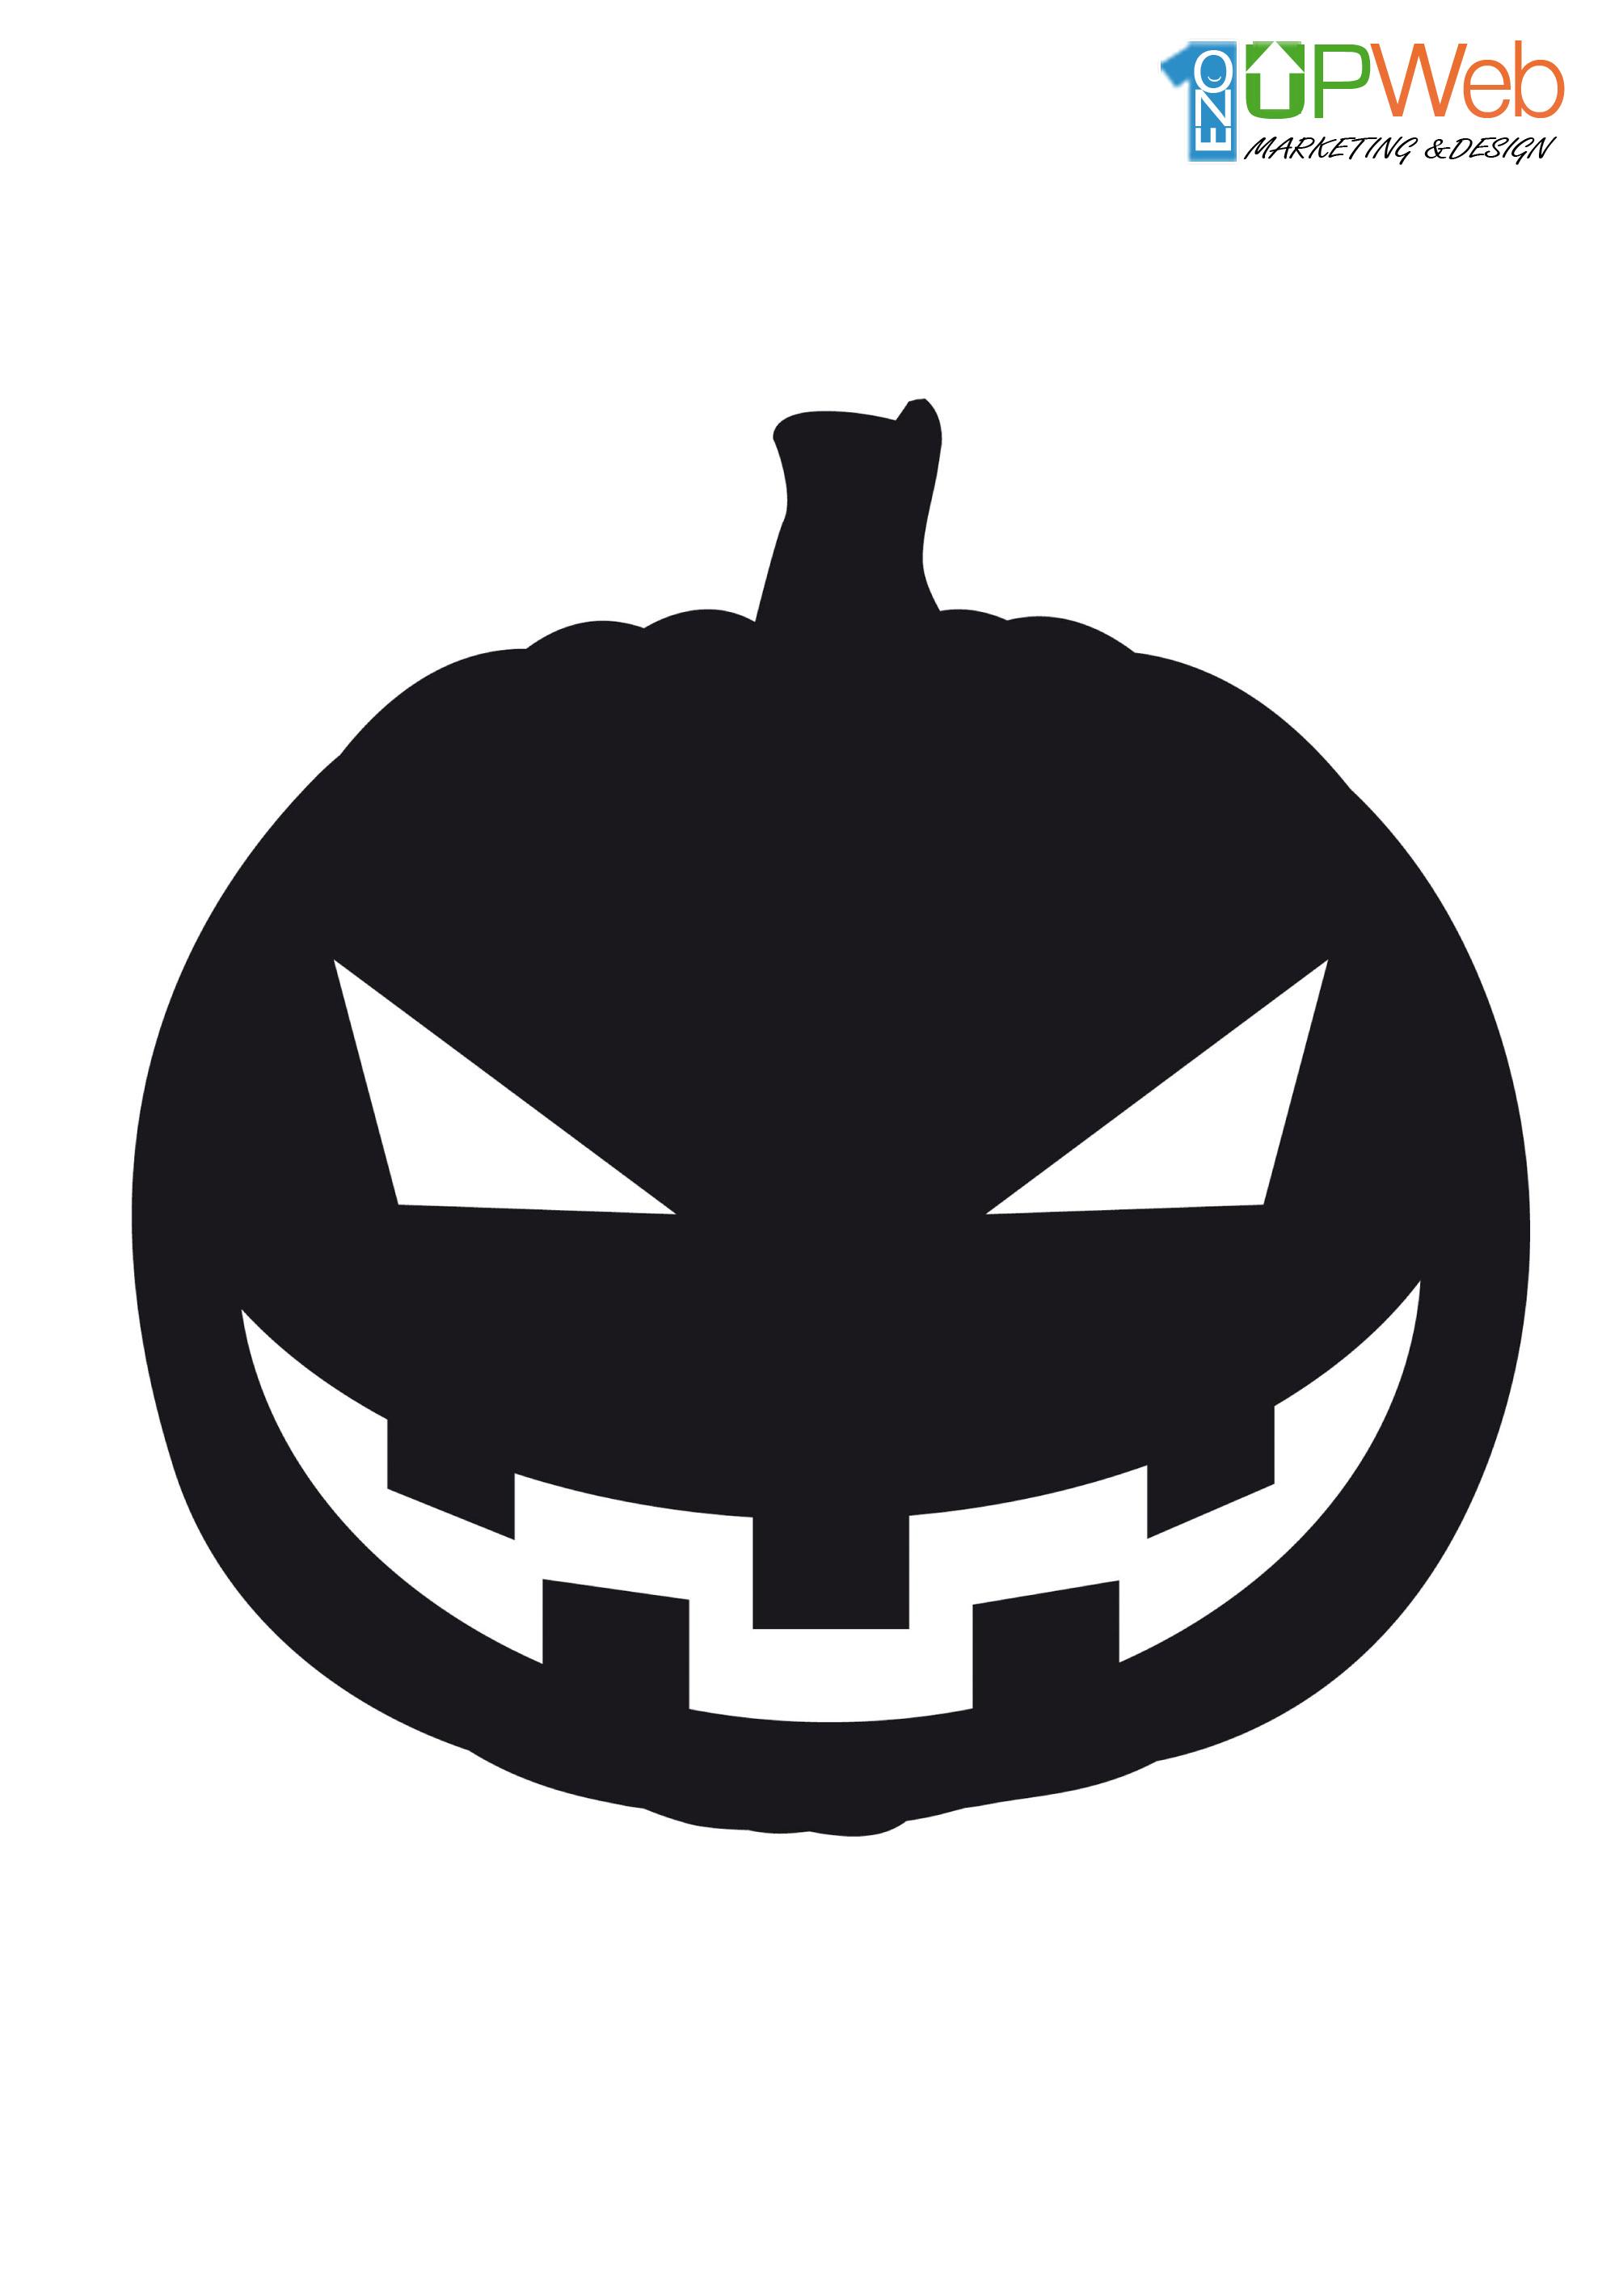 Plantillas para halloween dise o de paginas web - Plantillas para decorar calabazas halloween ...